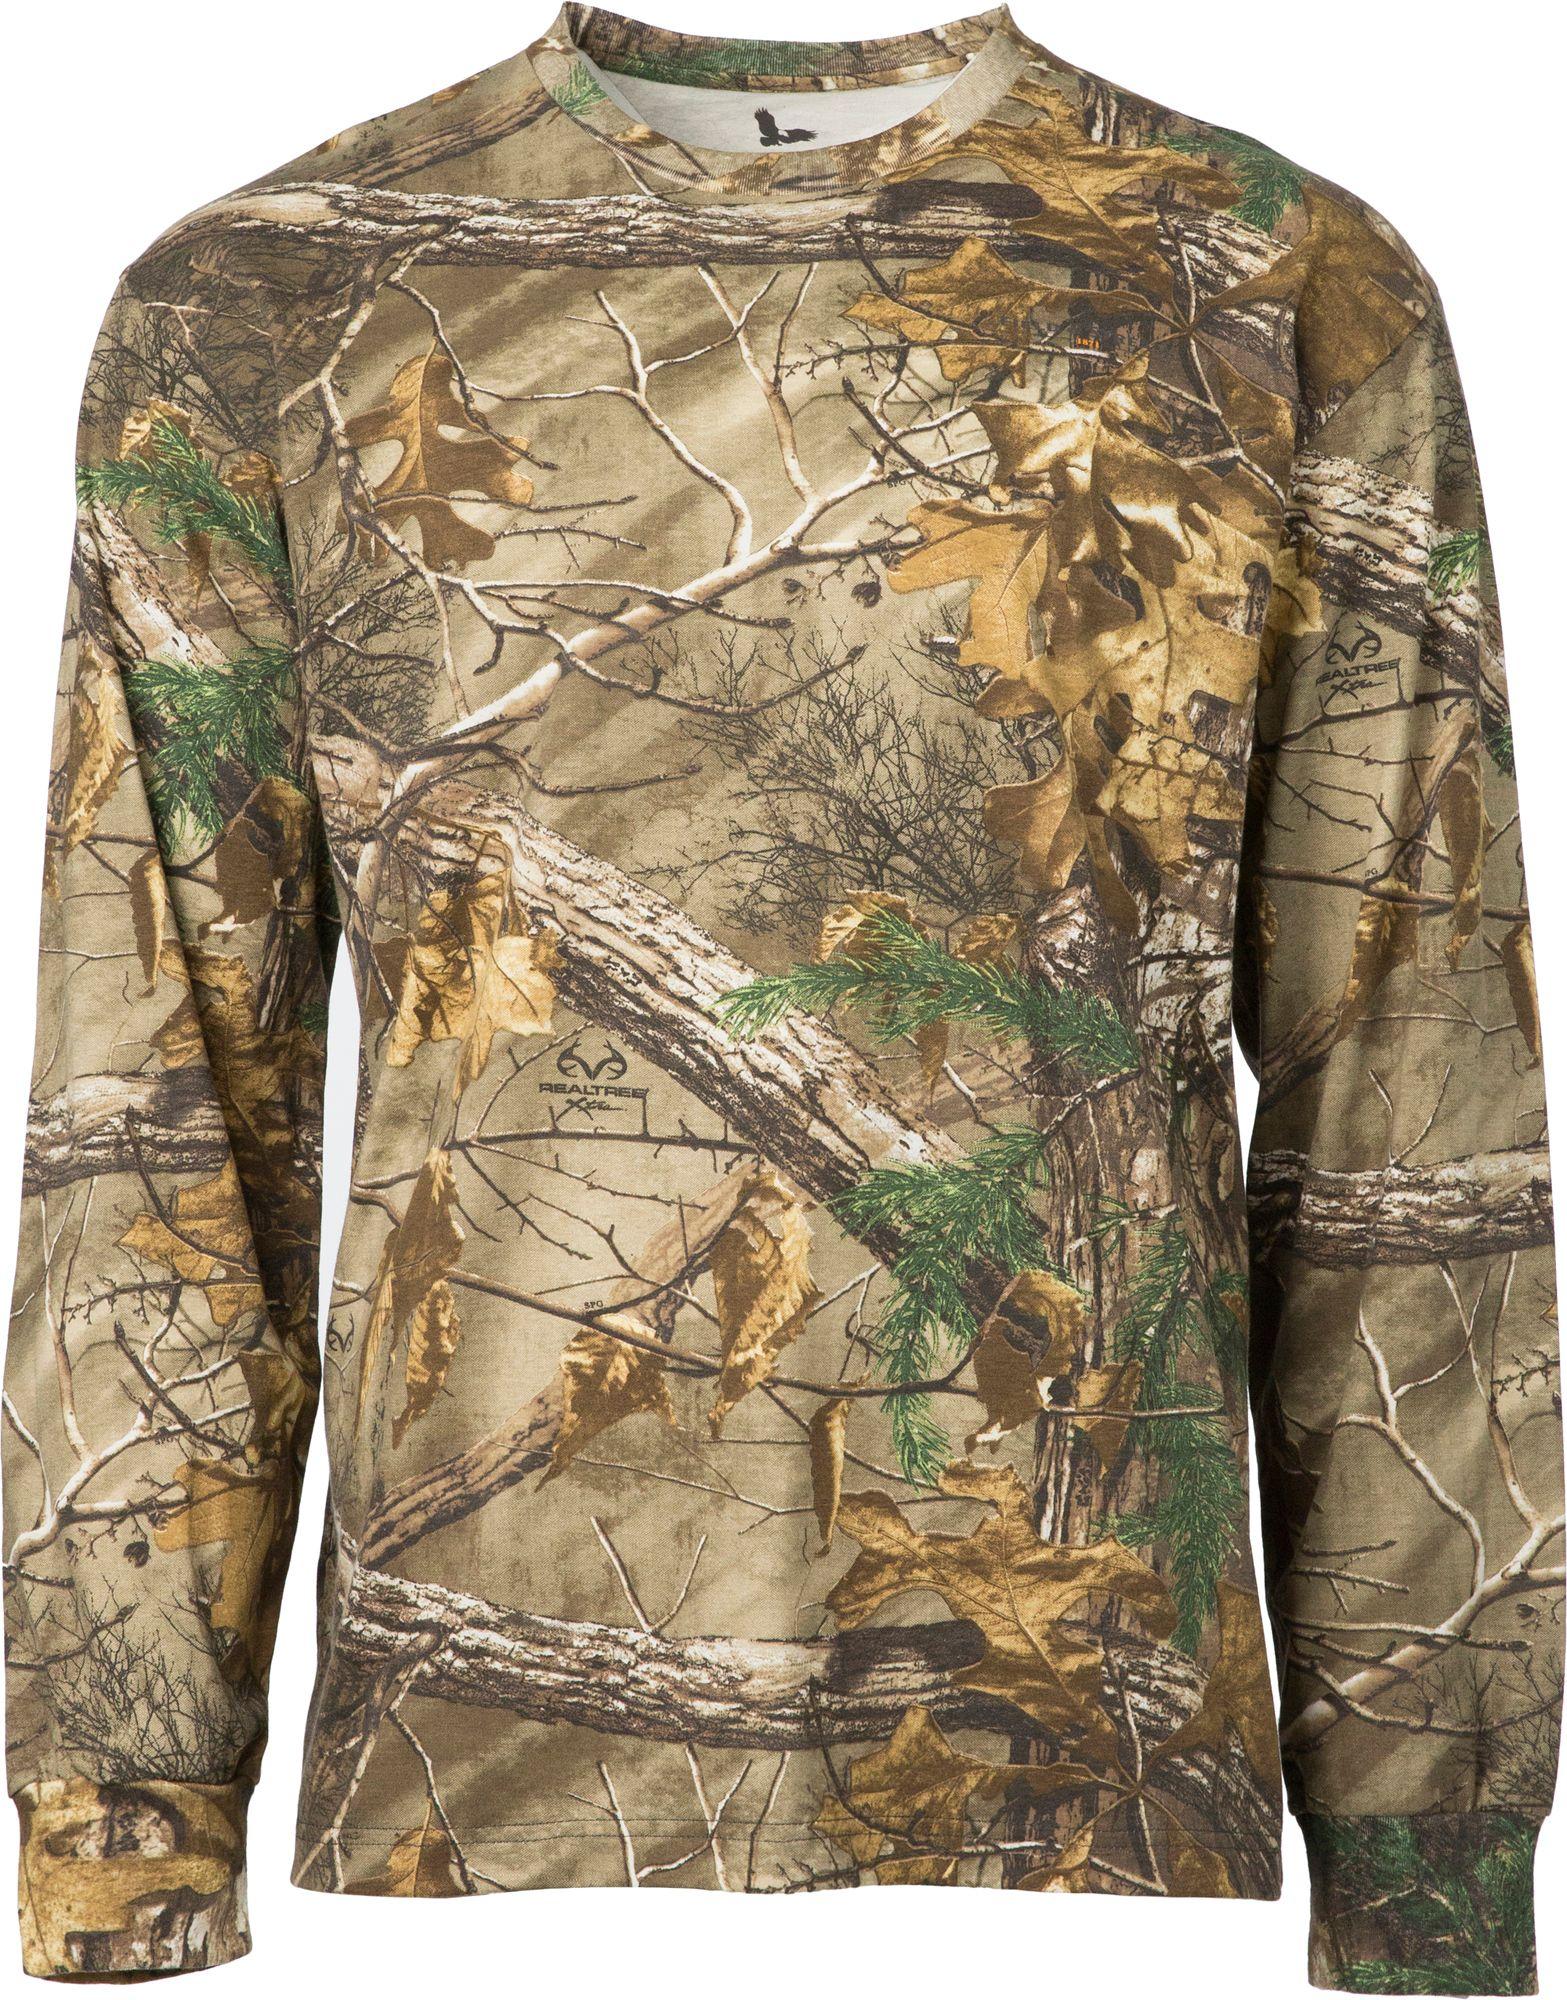 Field & Stream Men's Camo Long Sleeve Shirt, Size: Small, Multi